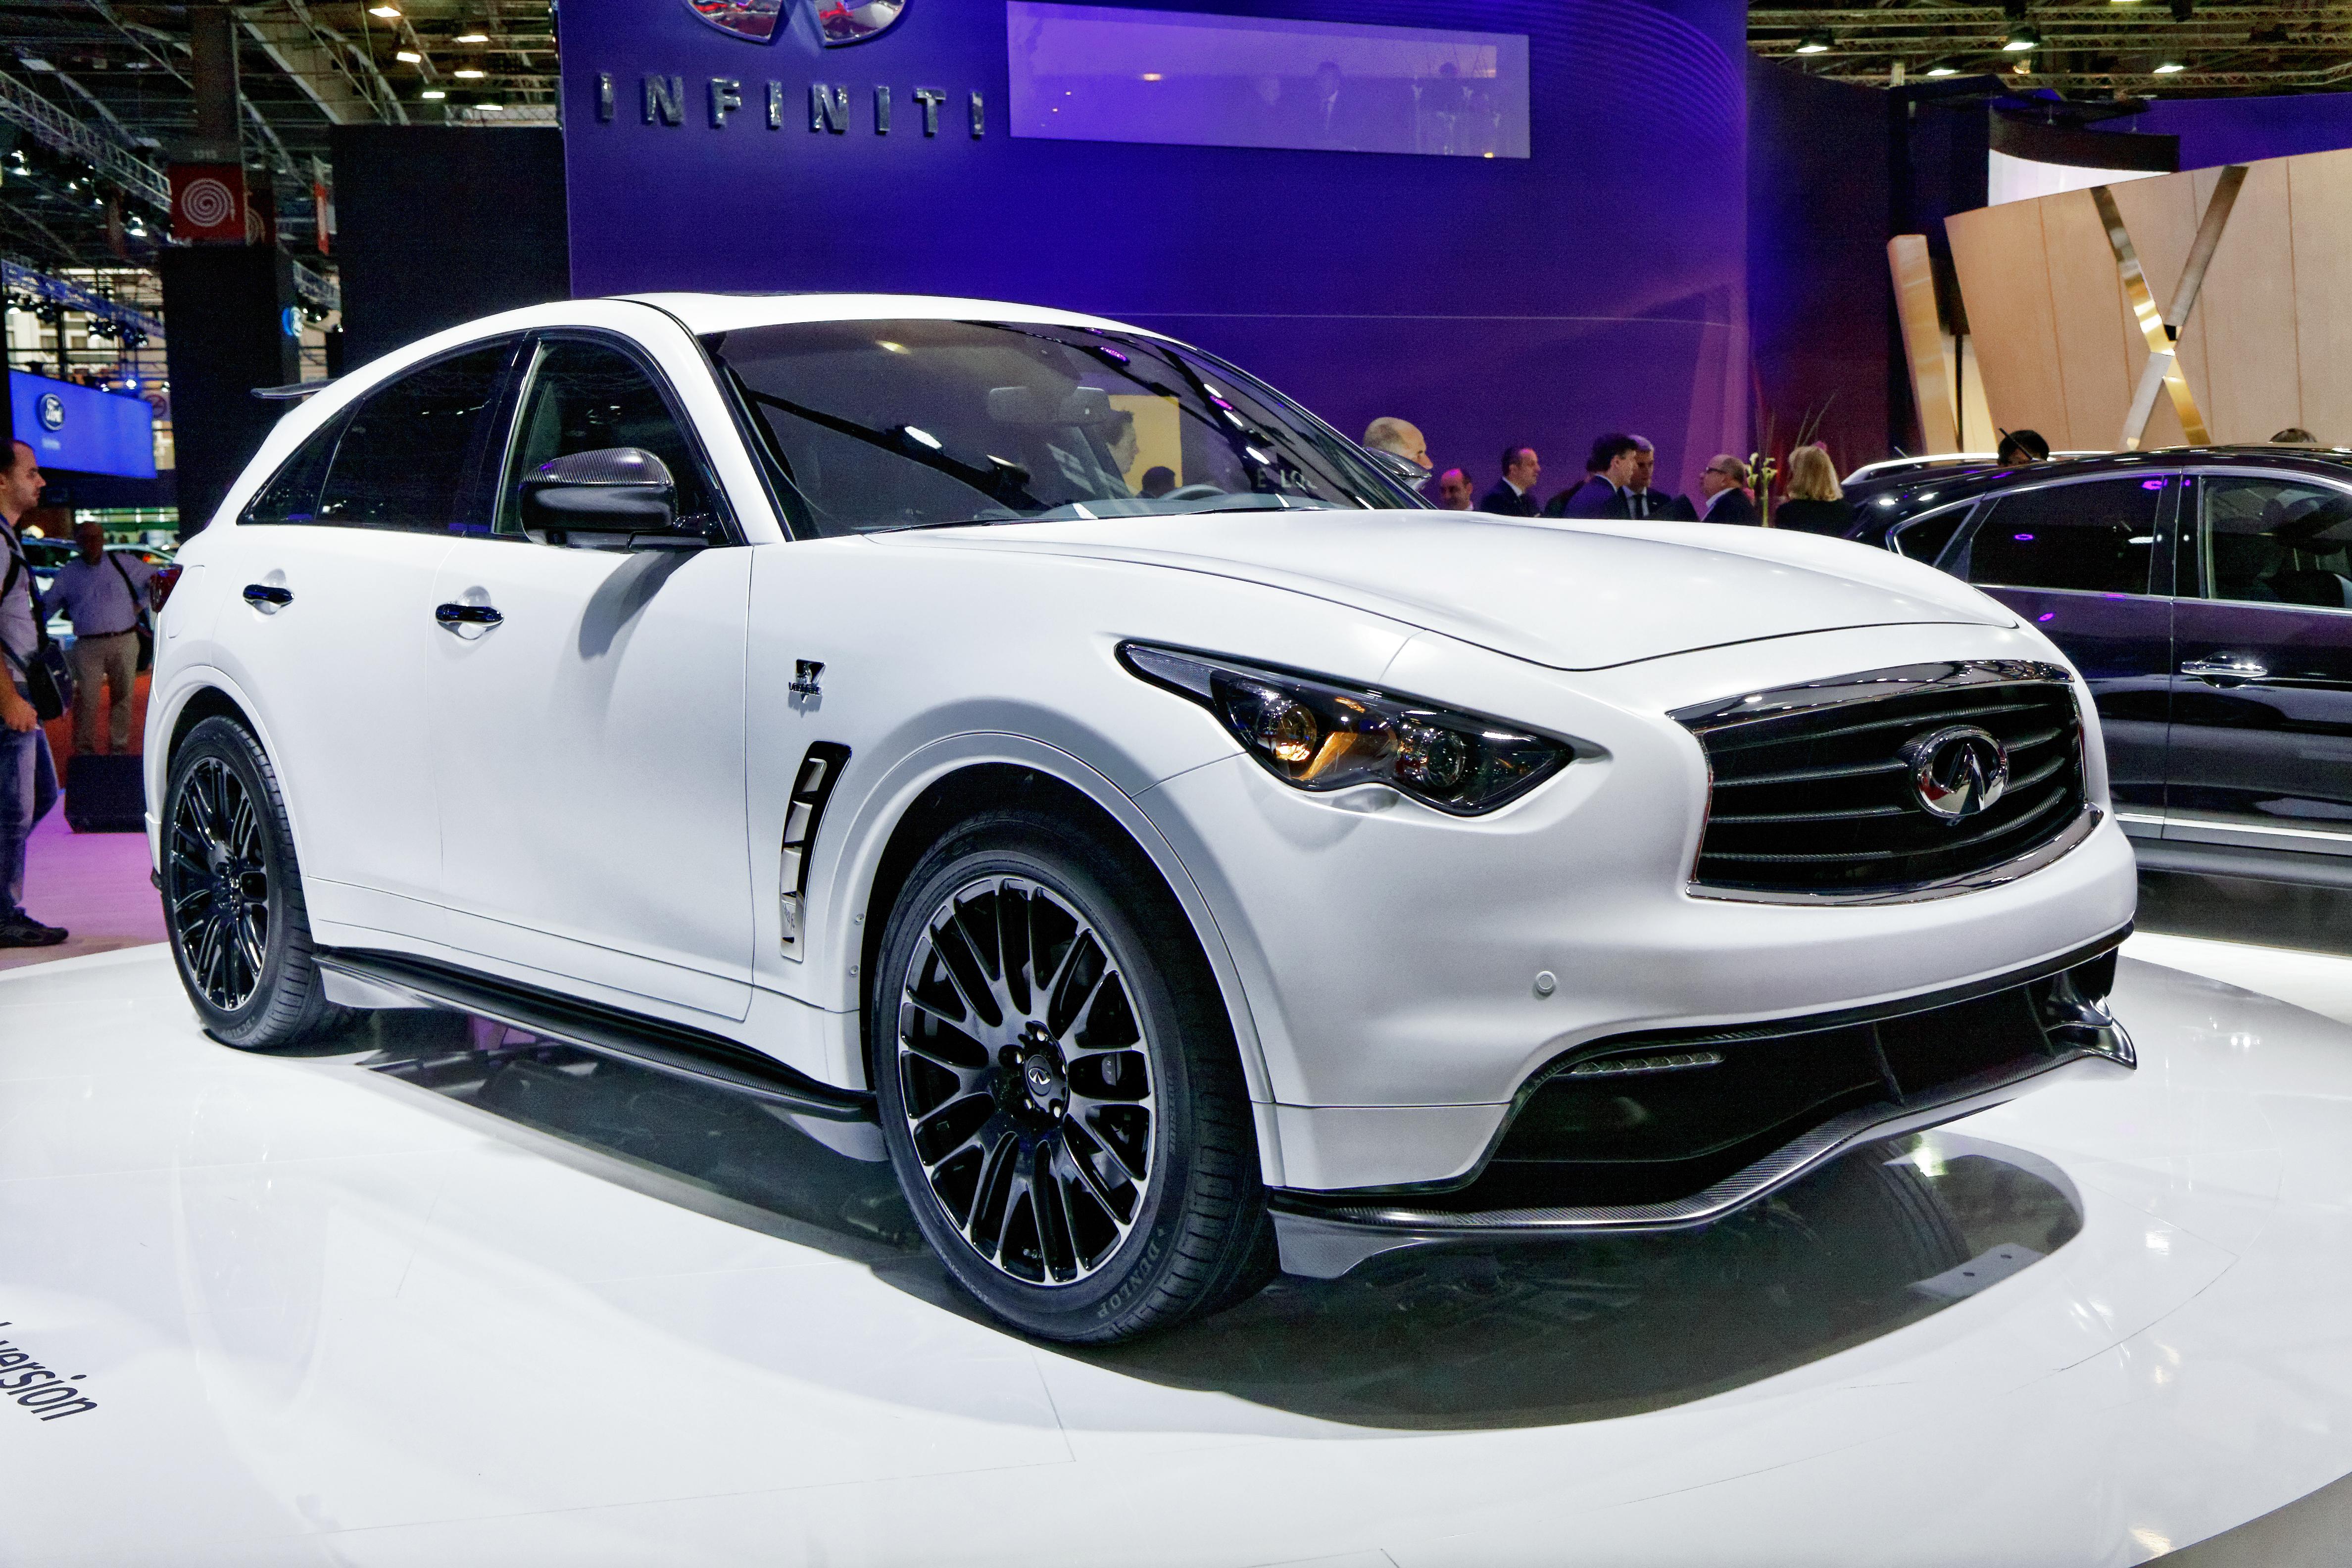 automobile usa infiniti reveals resize infinity daring coupe sports news world auto